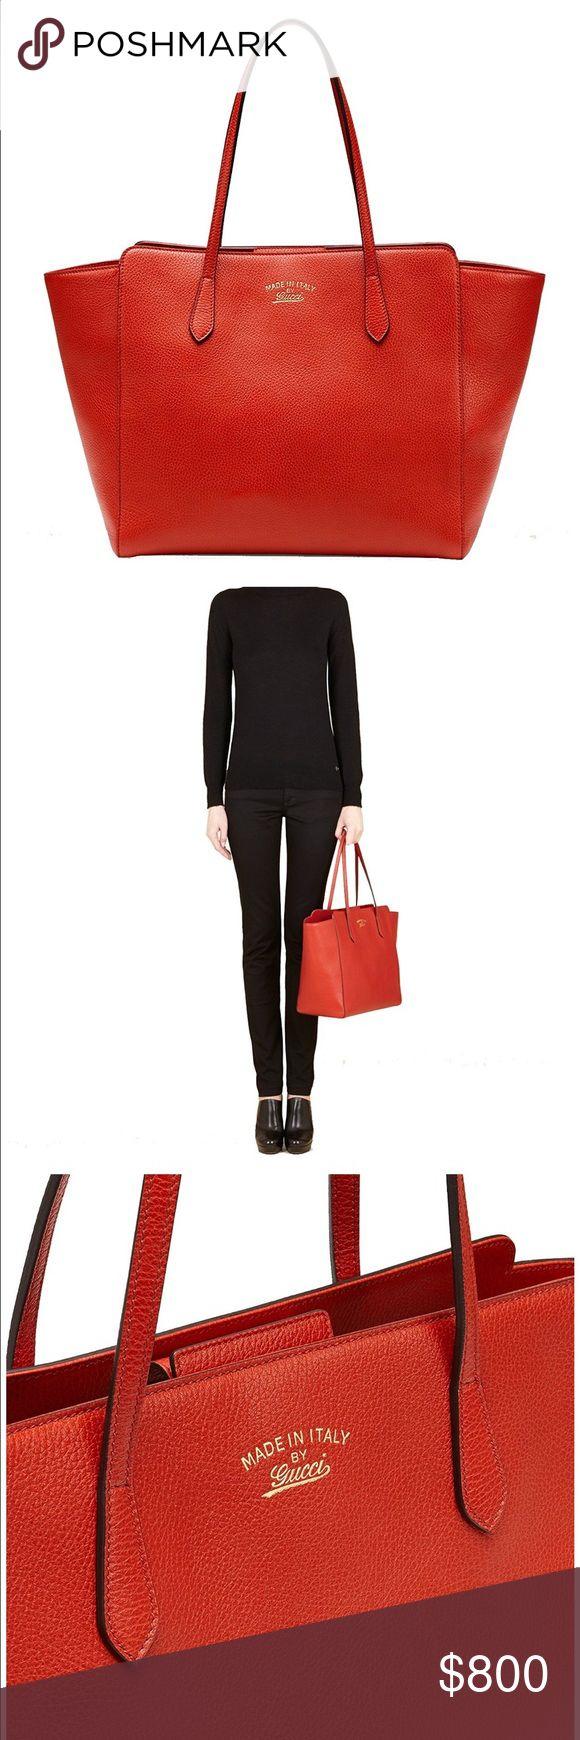 Gucci Swing Red-Orange Tote Bag Brand New, Authentic Gucci Tote Gucci Bags Totes